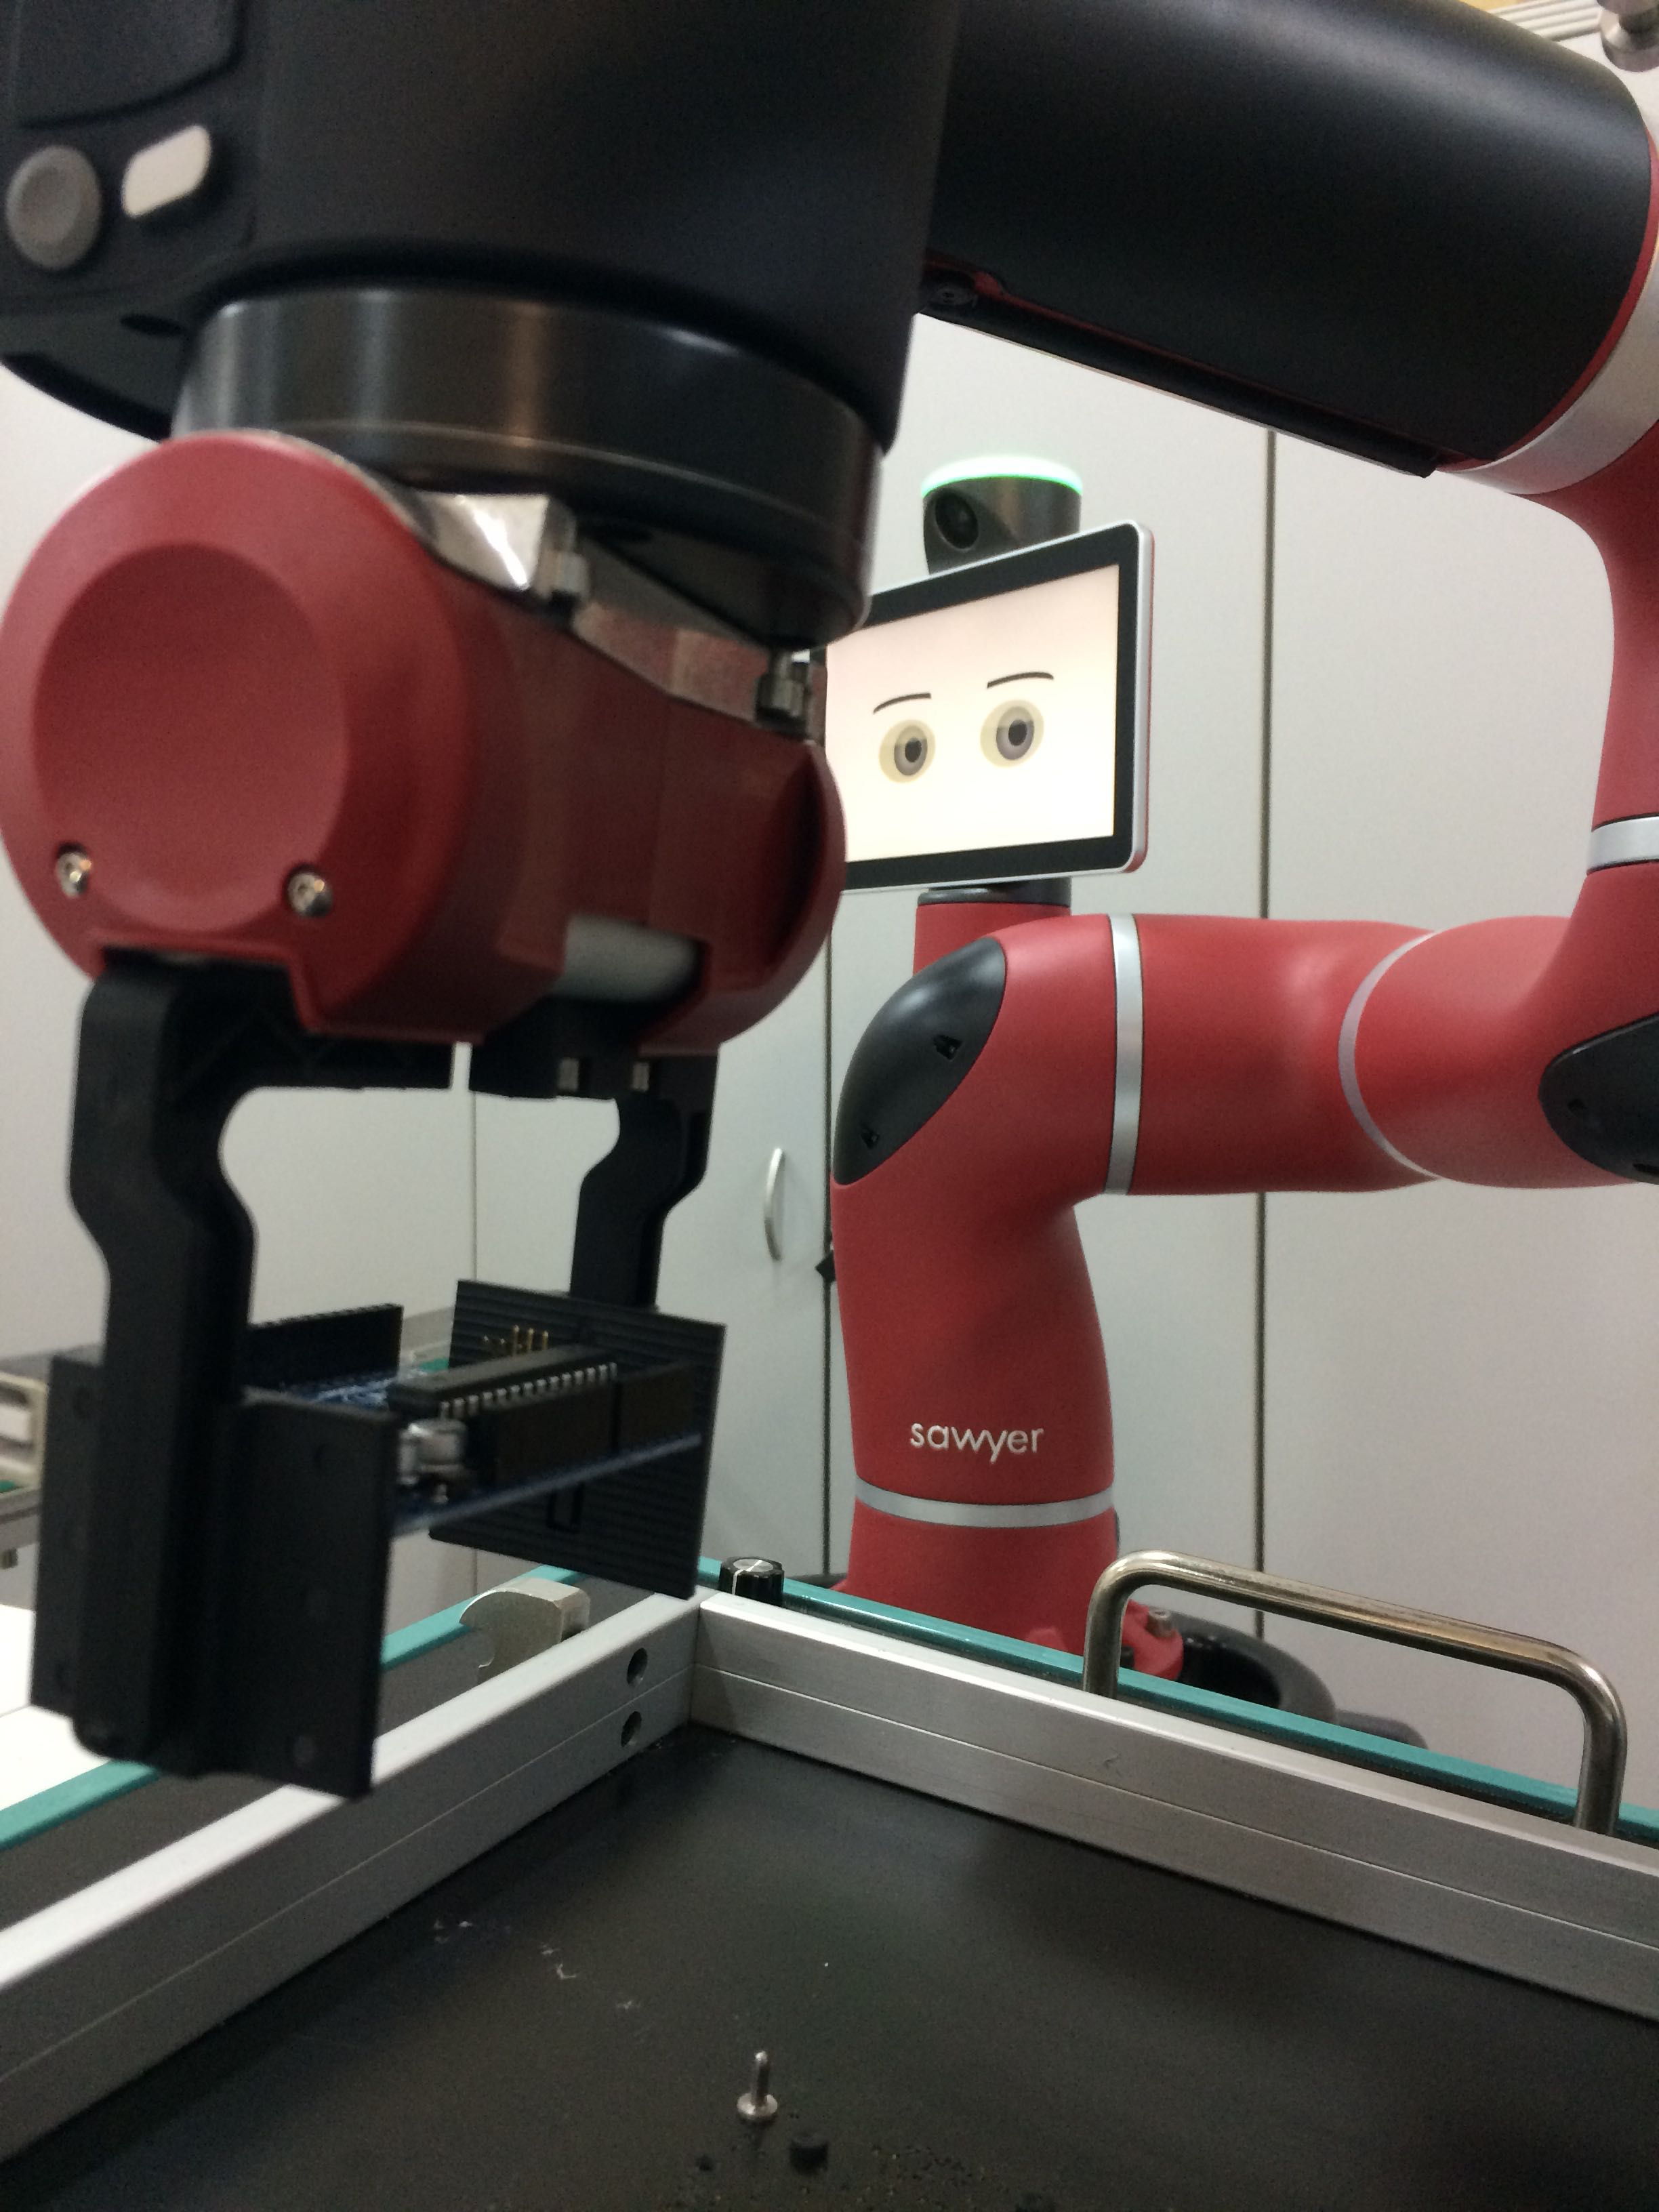 Lean Robots - Cobot Sawyer